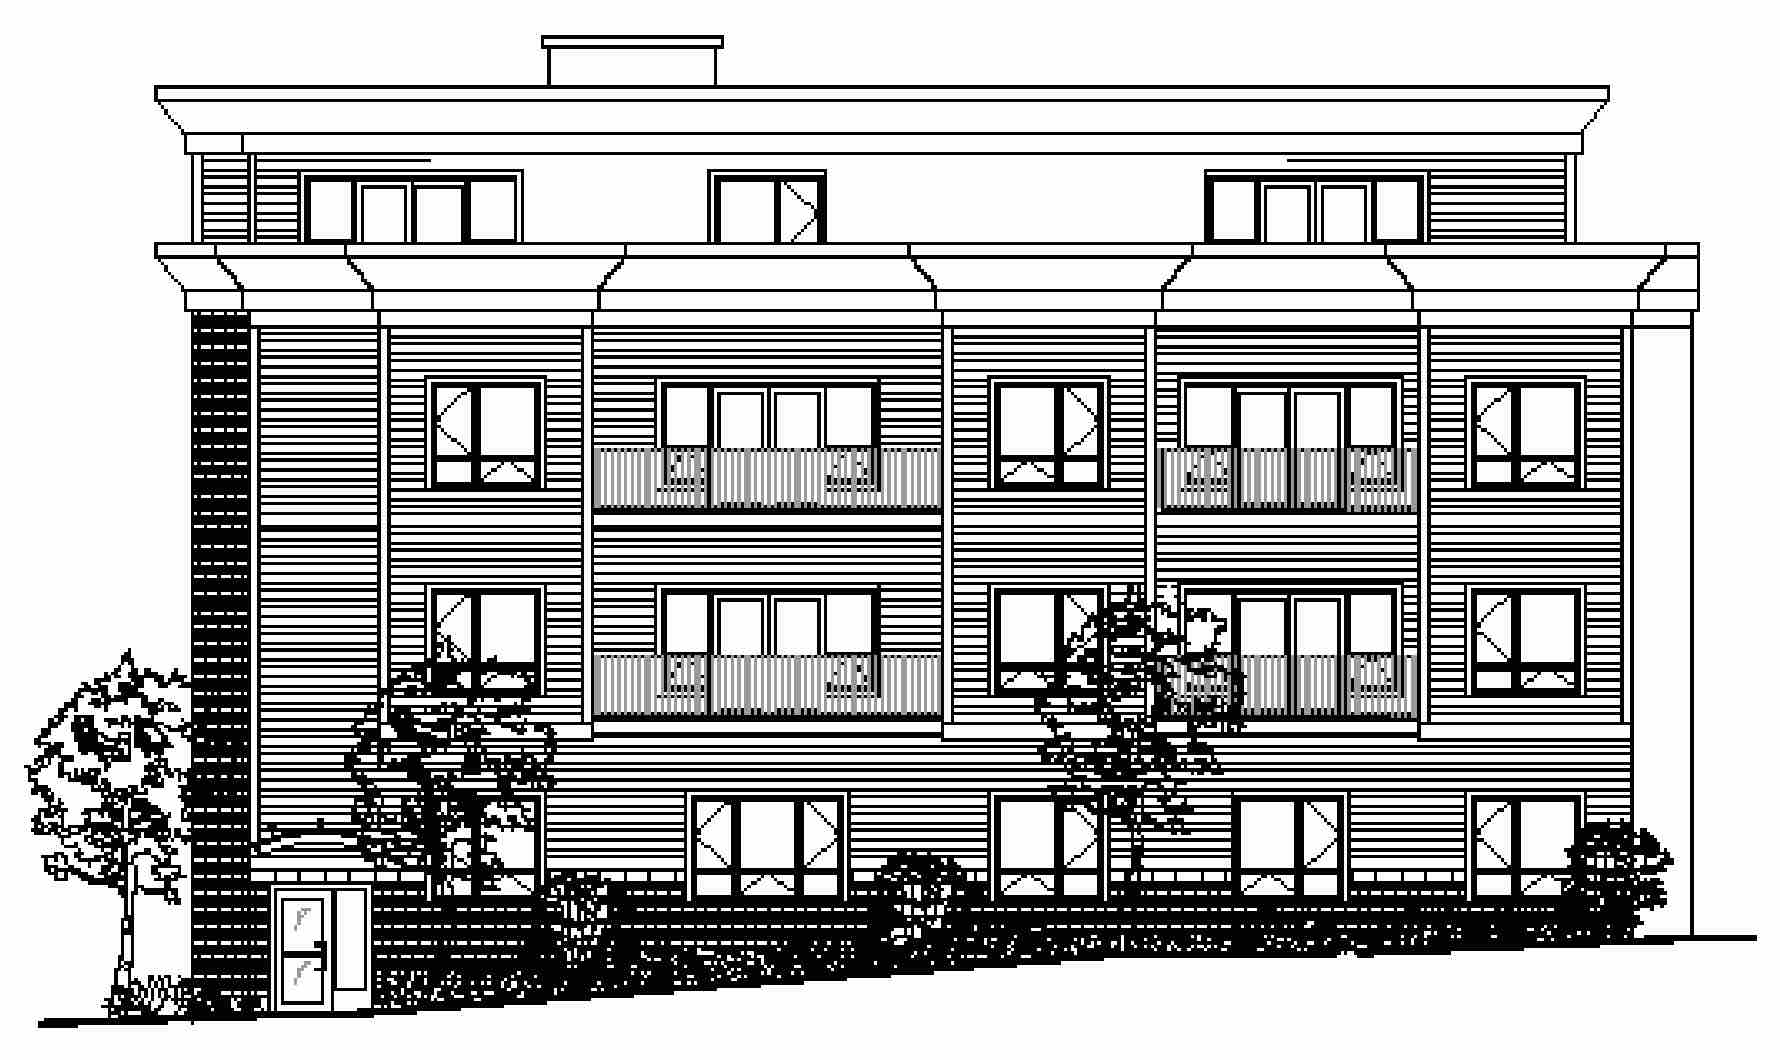 33 39 ward street andrew square south boston condominiums residential development